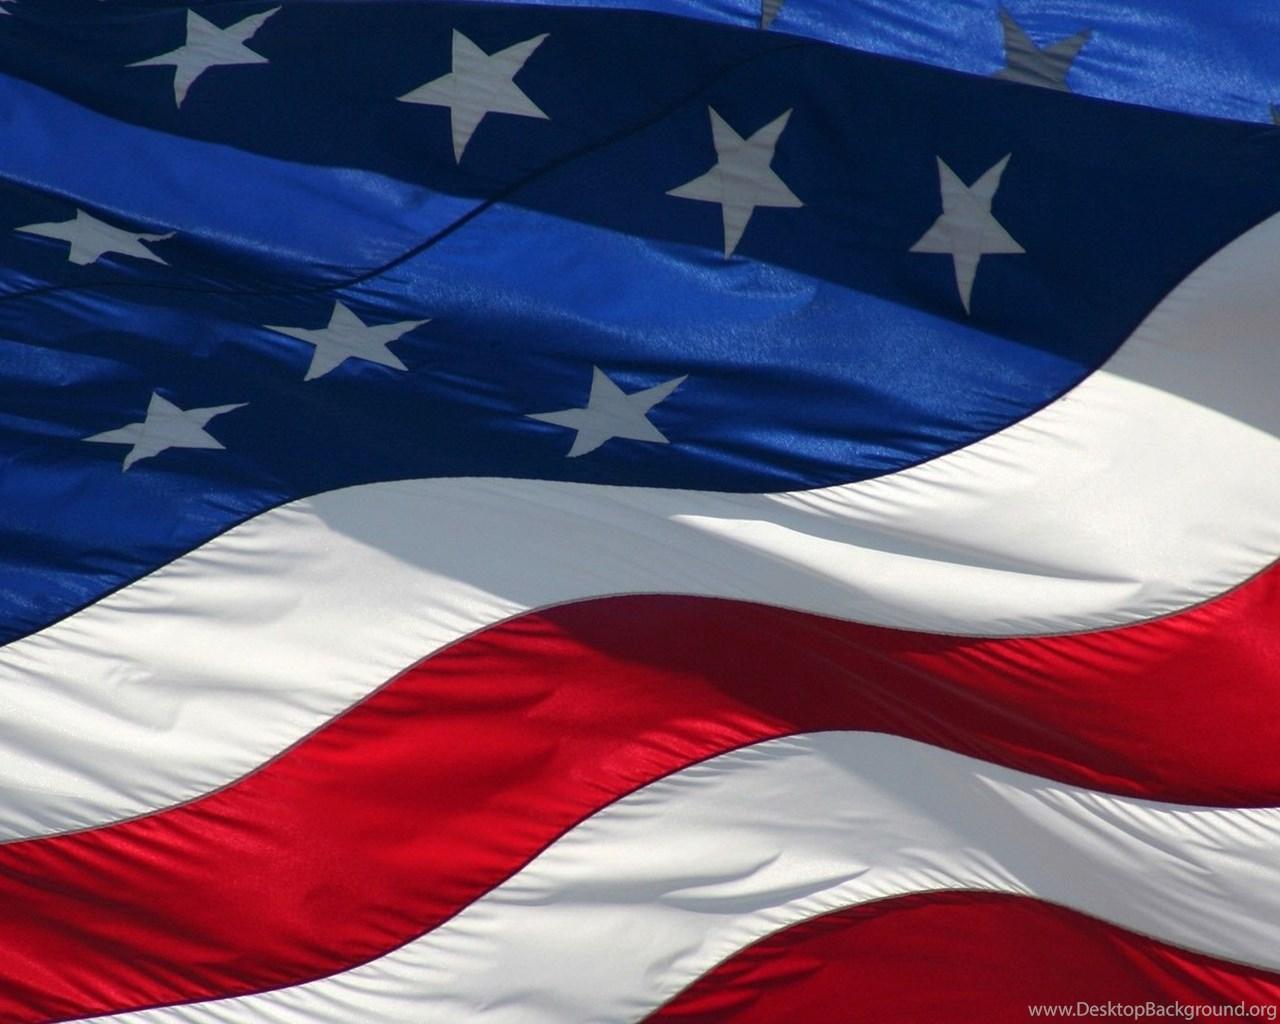 usa flag hd wallpaper, usa flag images free, new wallpapers desktop